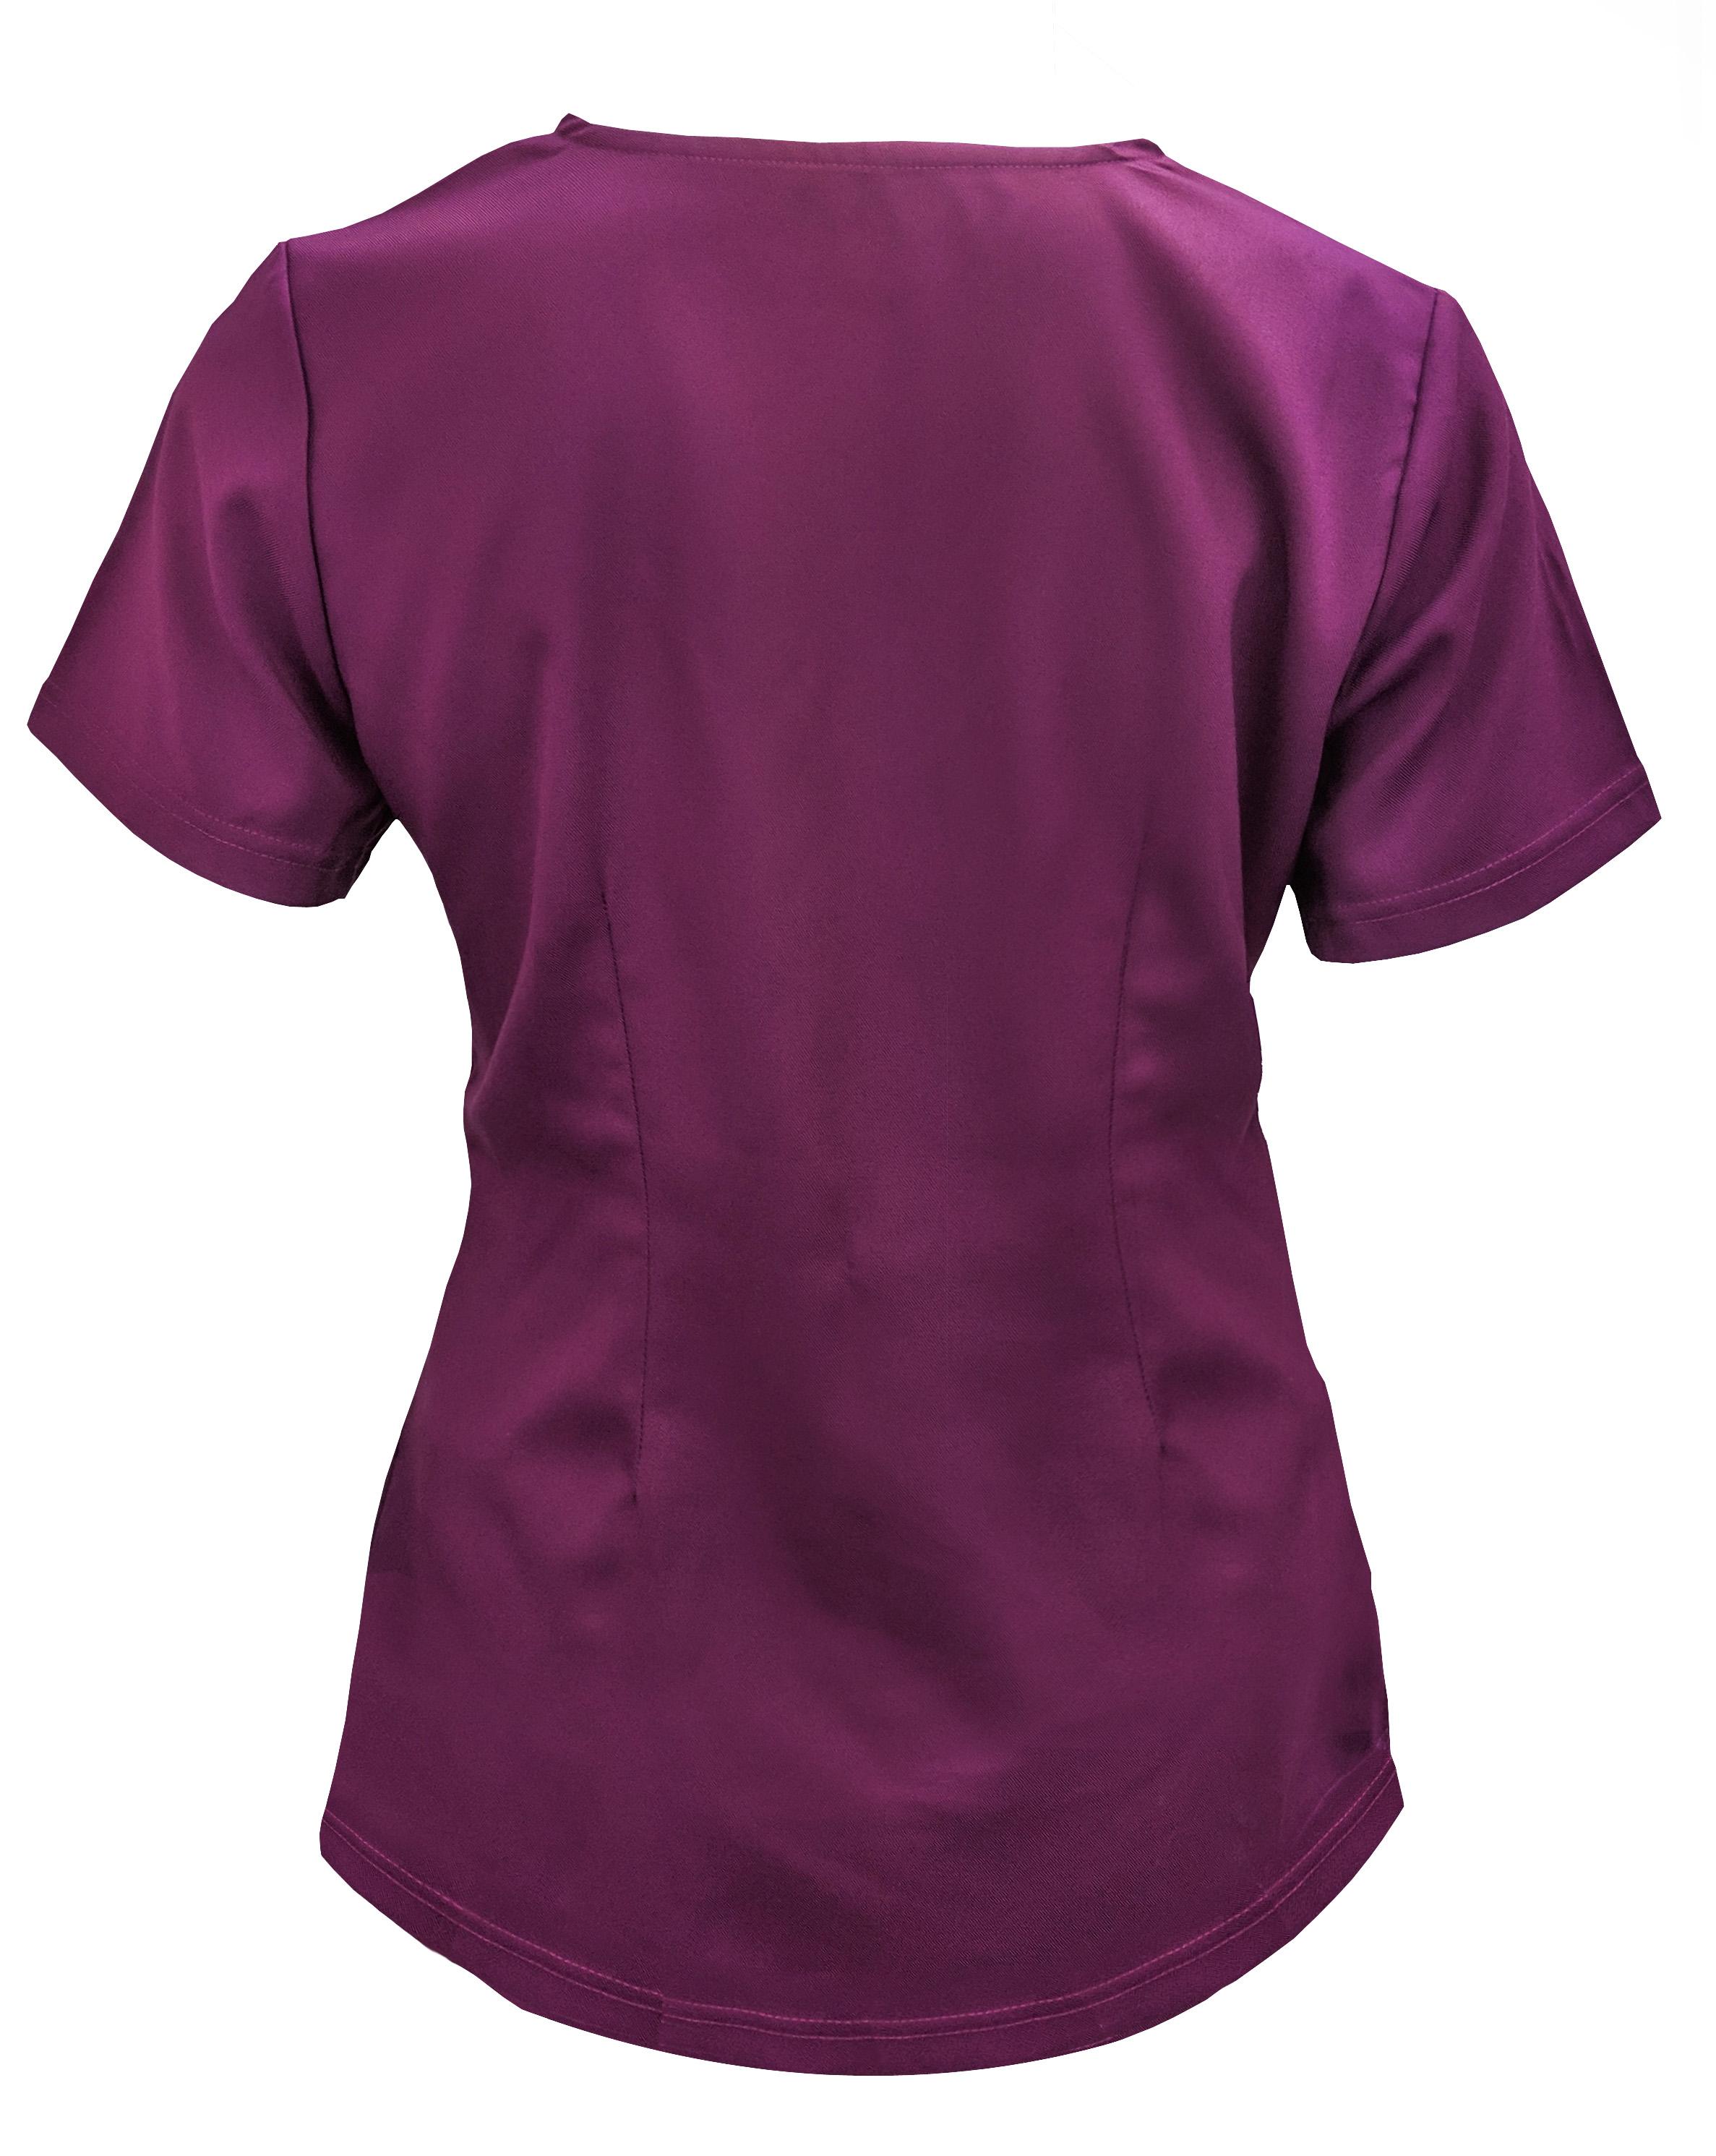 Soulful-Scrubs-Women-039-s-2336-2-Pocket-V-Neck-Scrub-Top miniature 22